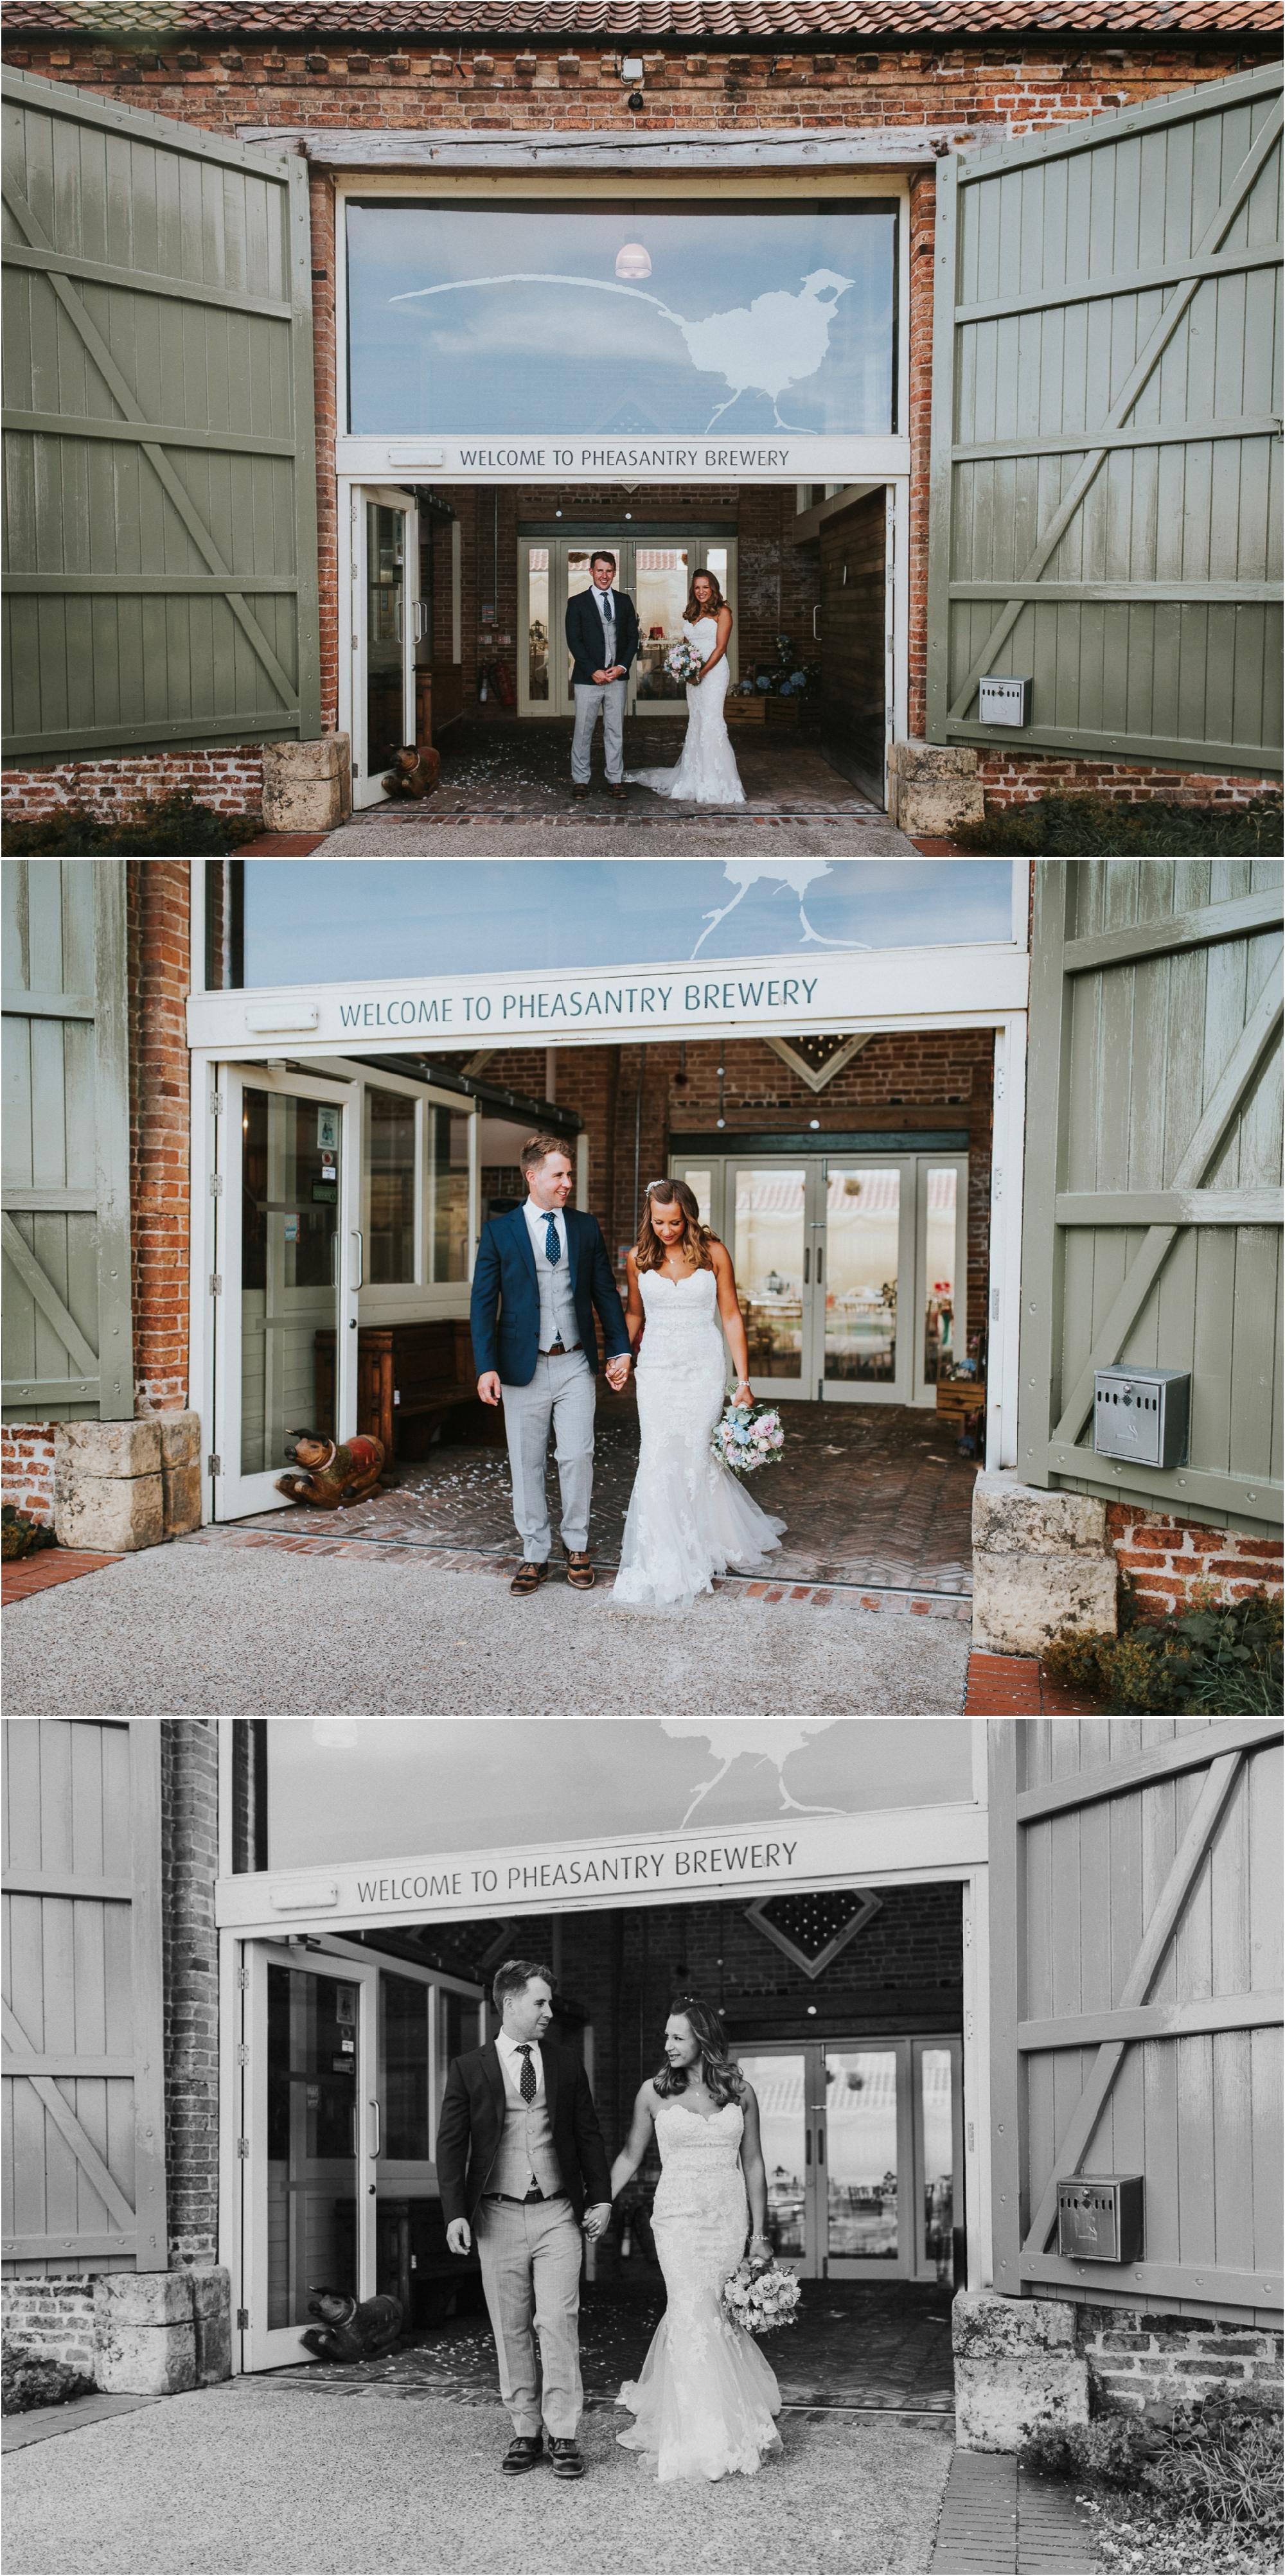 PheasantBrewery-LukeHolroyd-Yorkshirewedding_000139.jpg